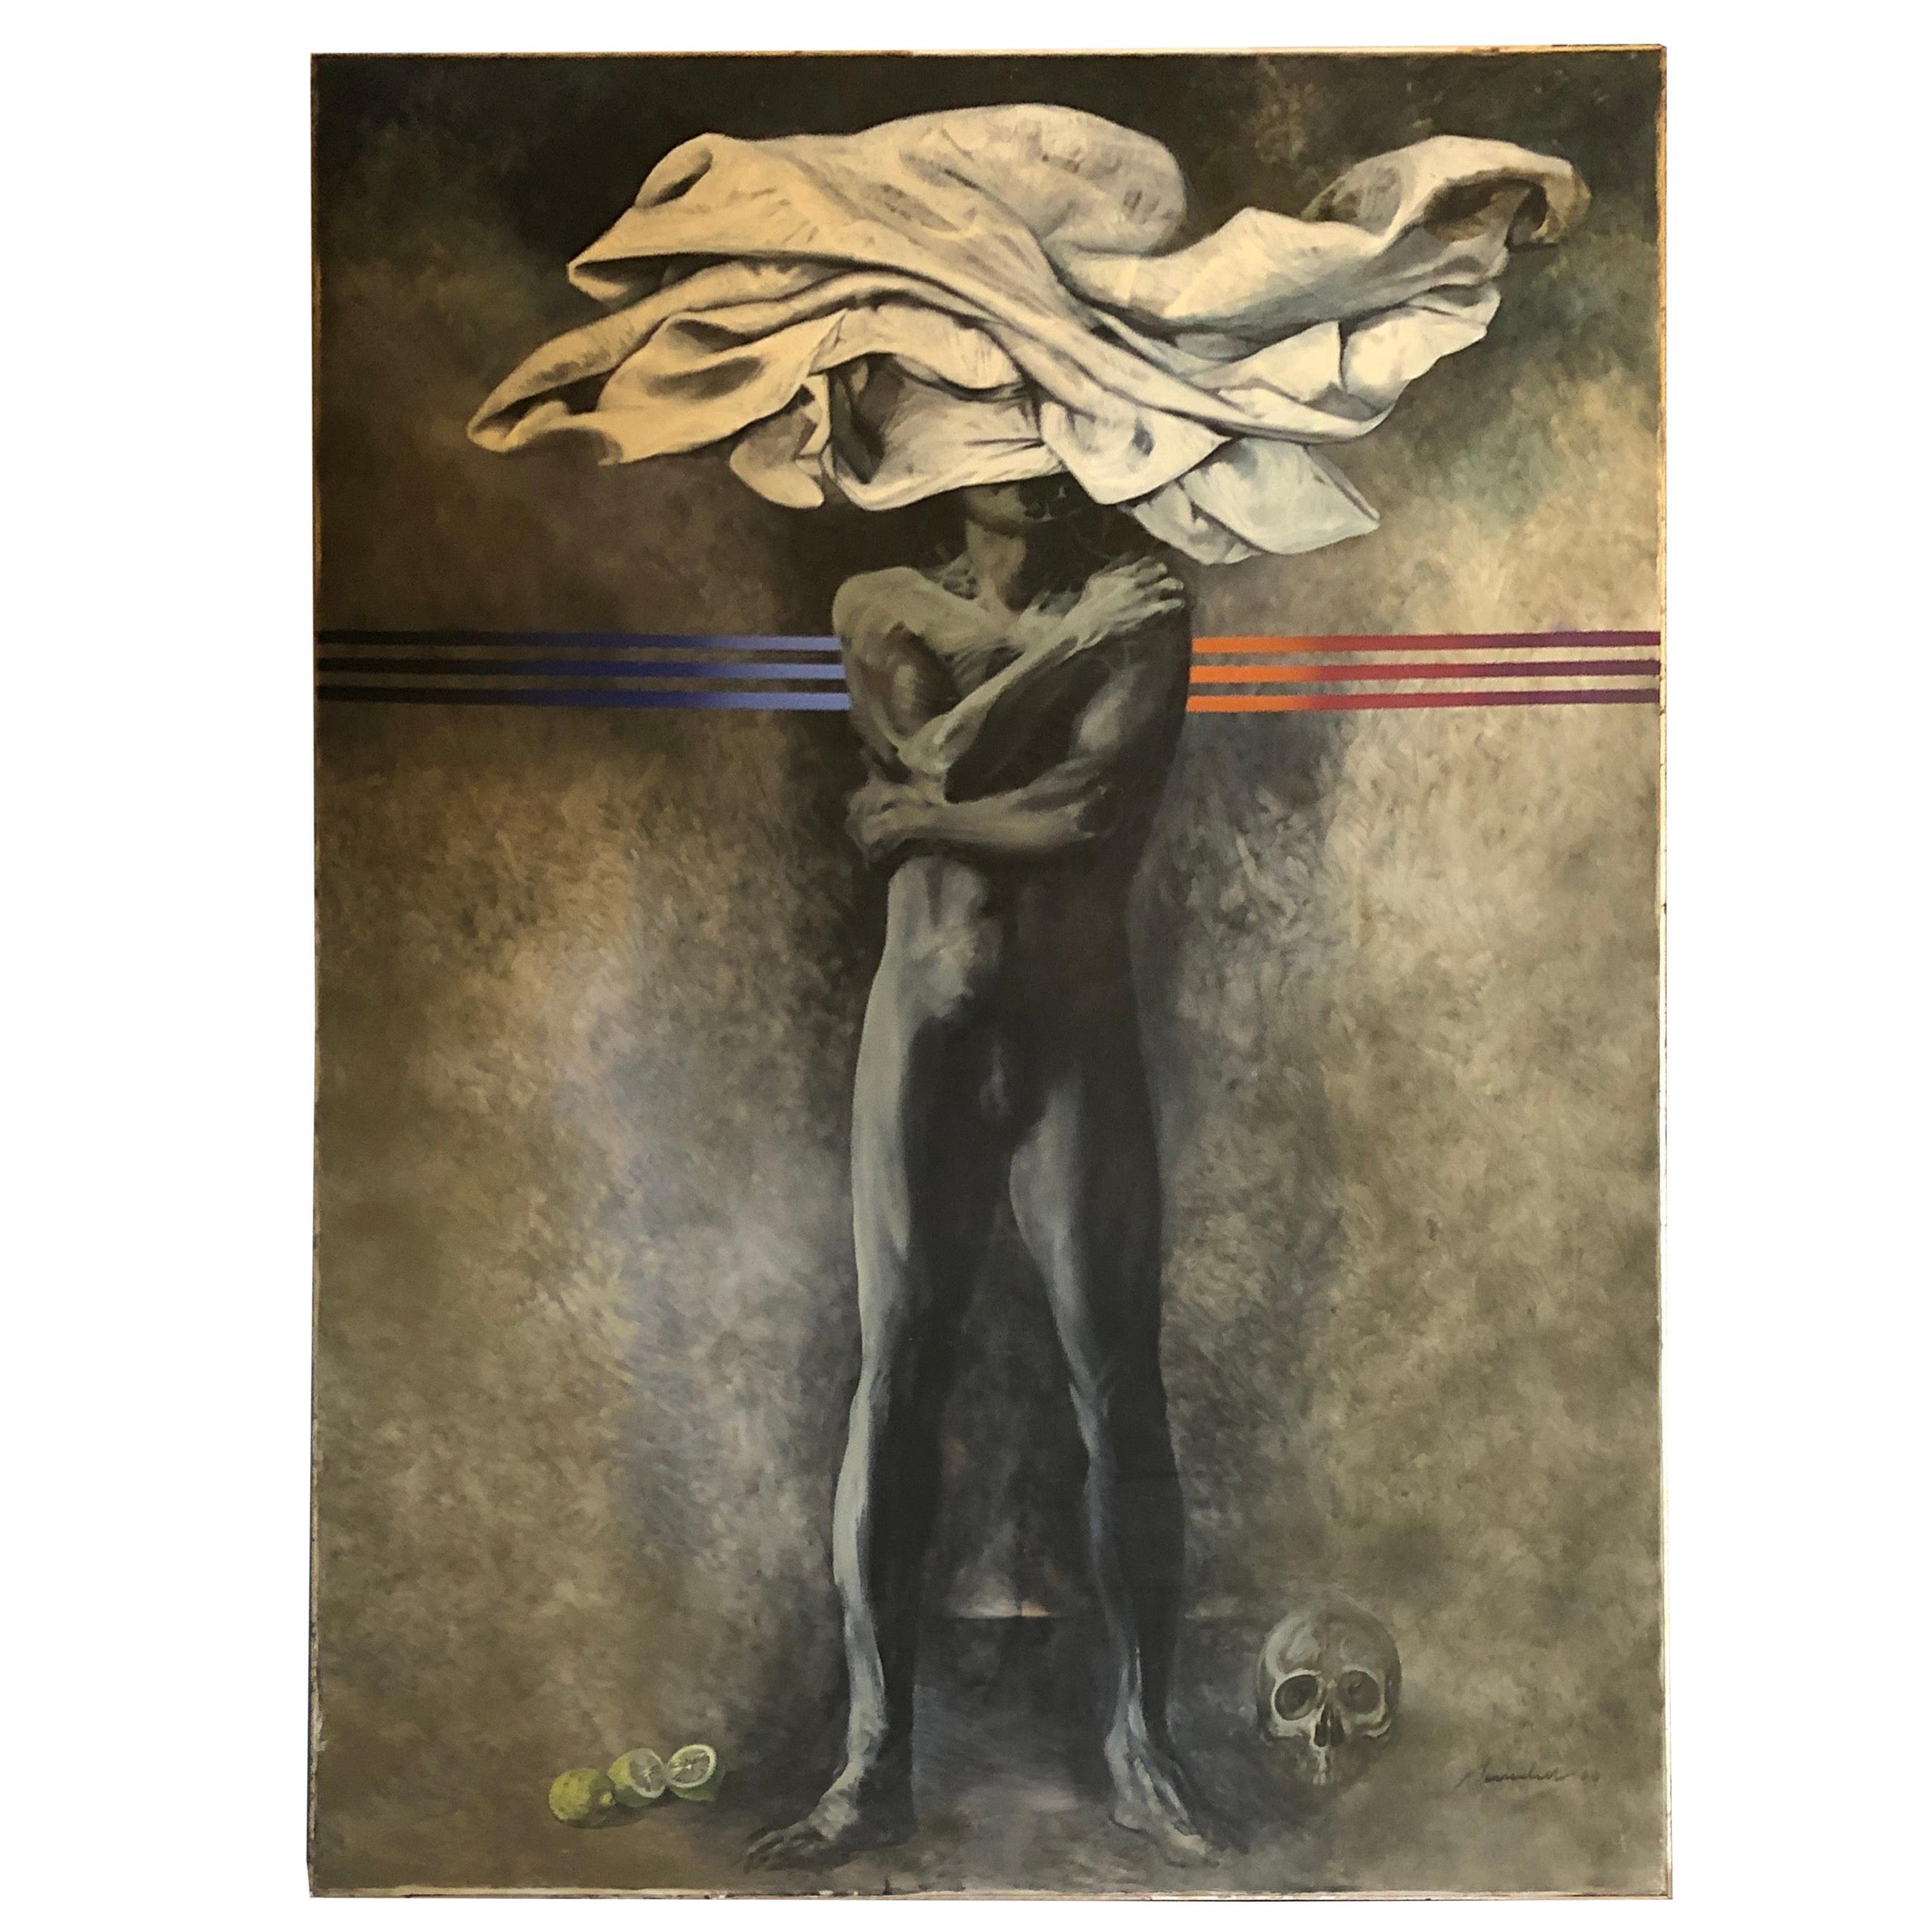 Silvio Benedetto Metaphysic Oil on Canvas, circa 1970